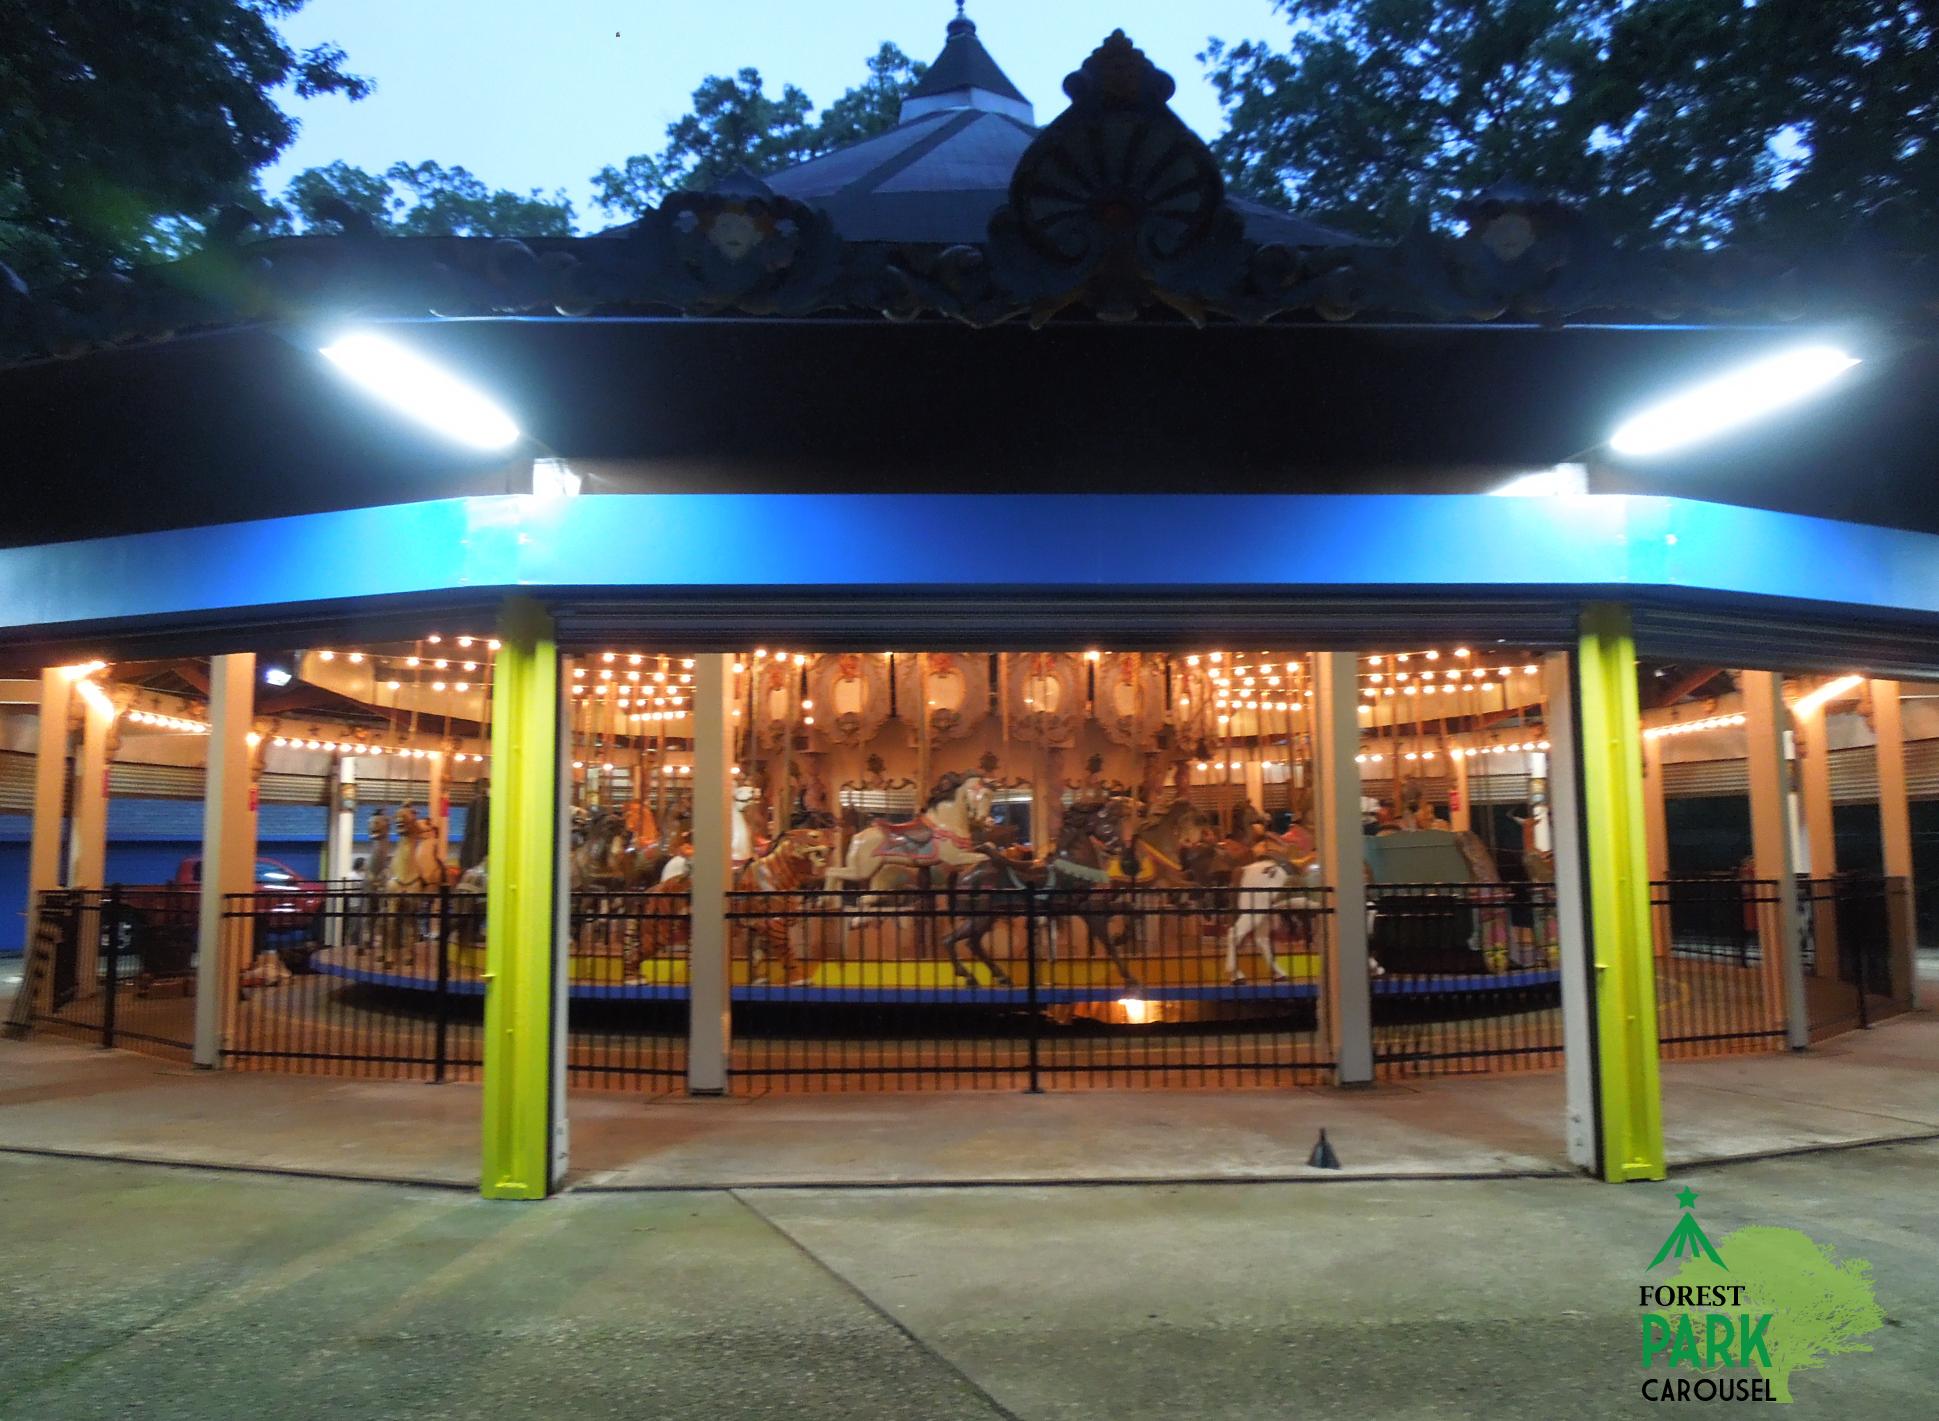 Forest Park Carousel Ride Entertainments